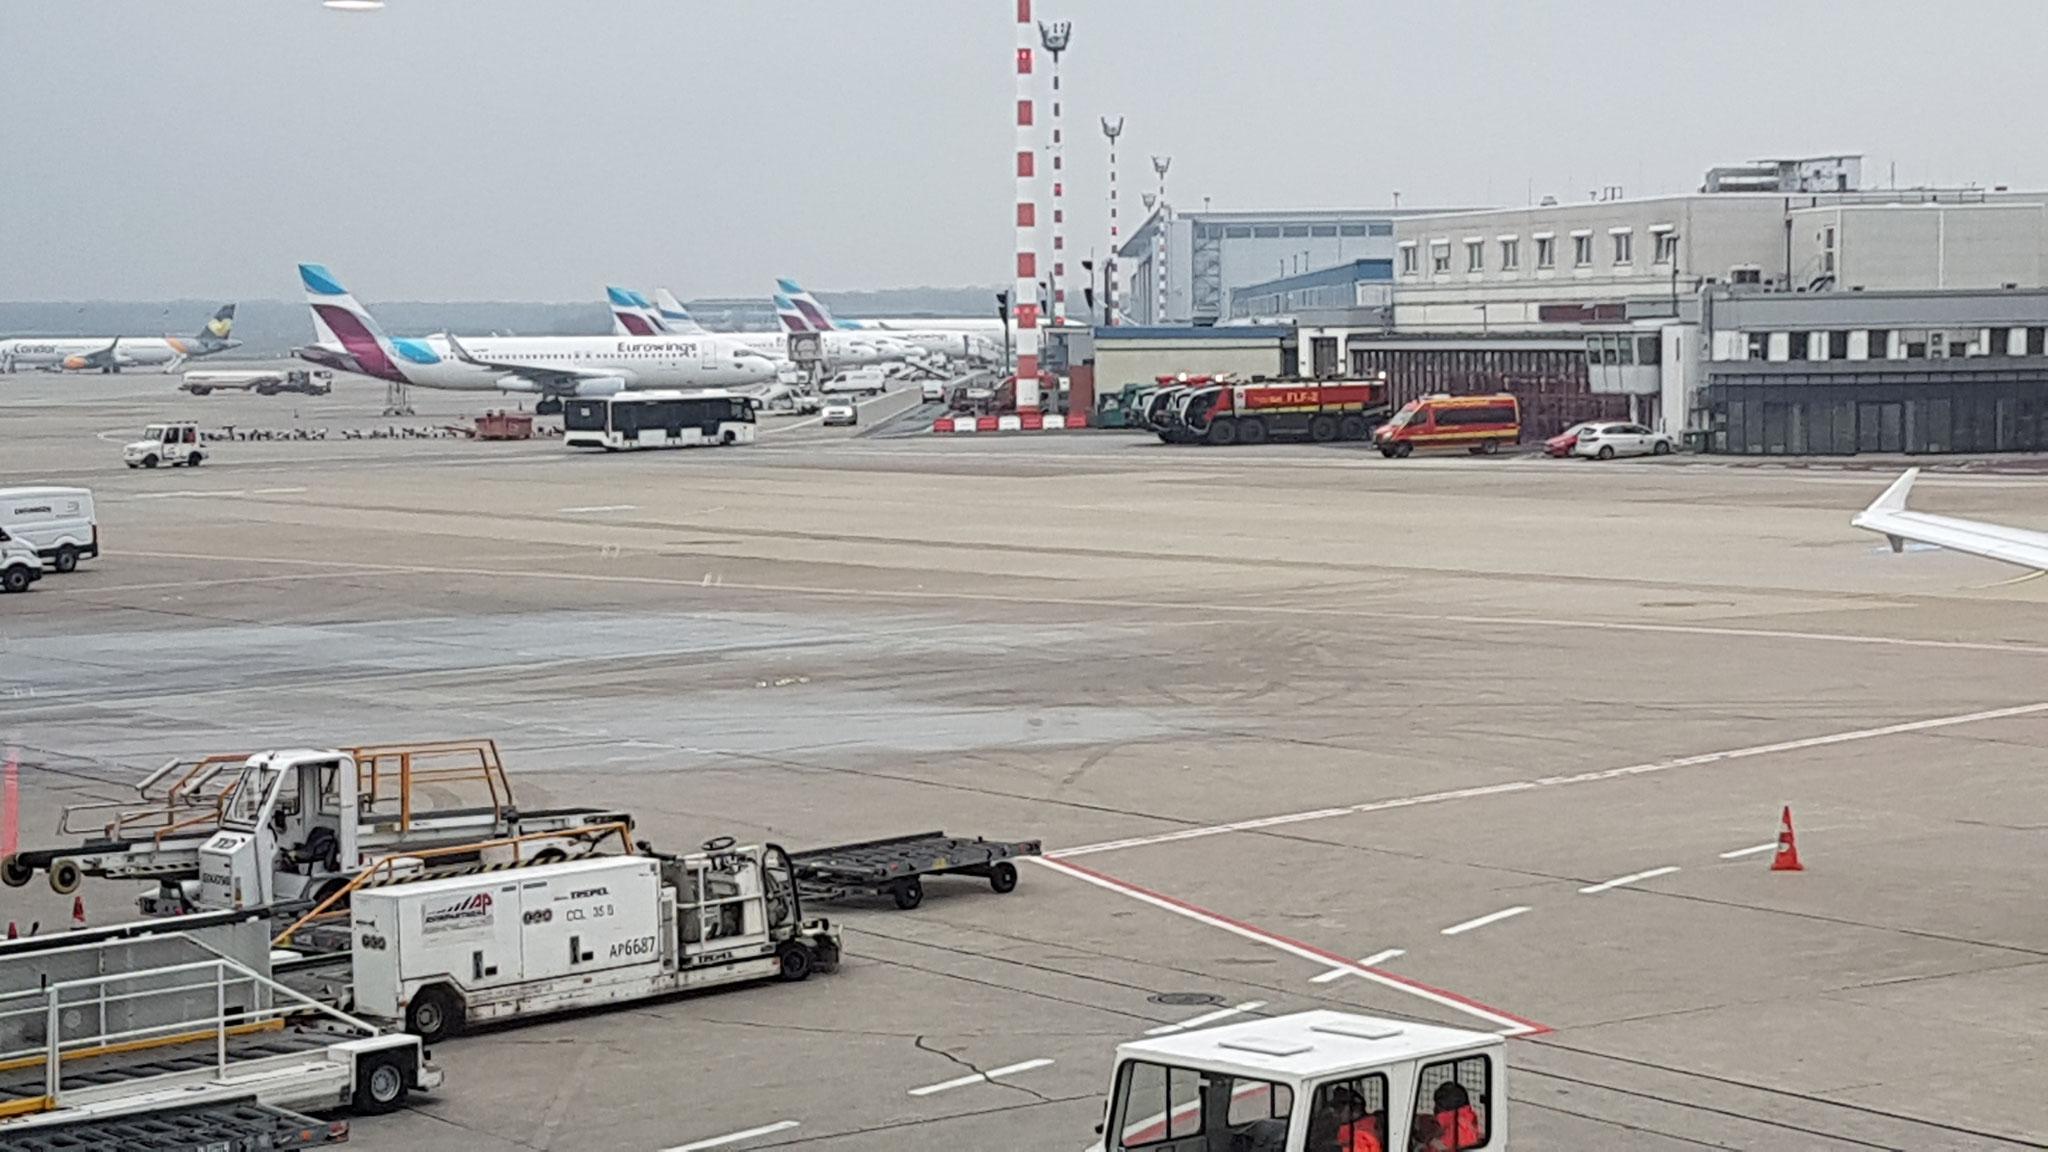 Sprengstoffkontrolle Flughafen